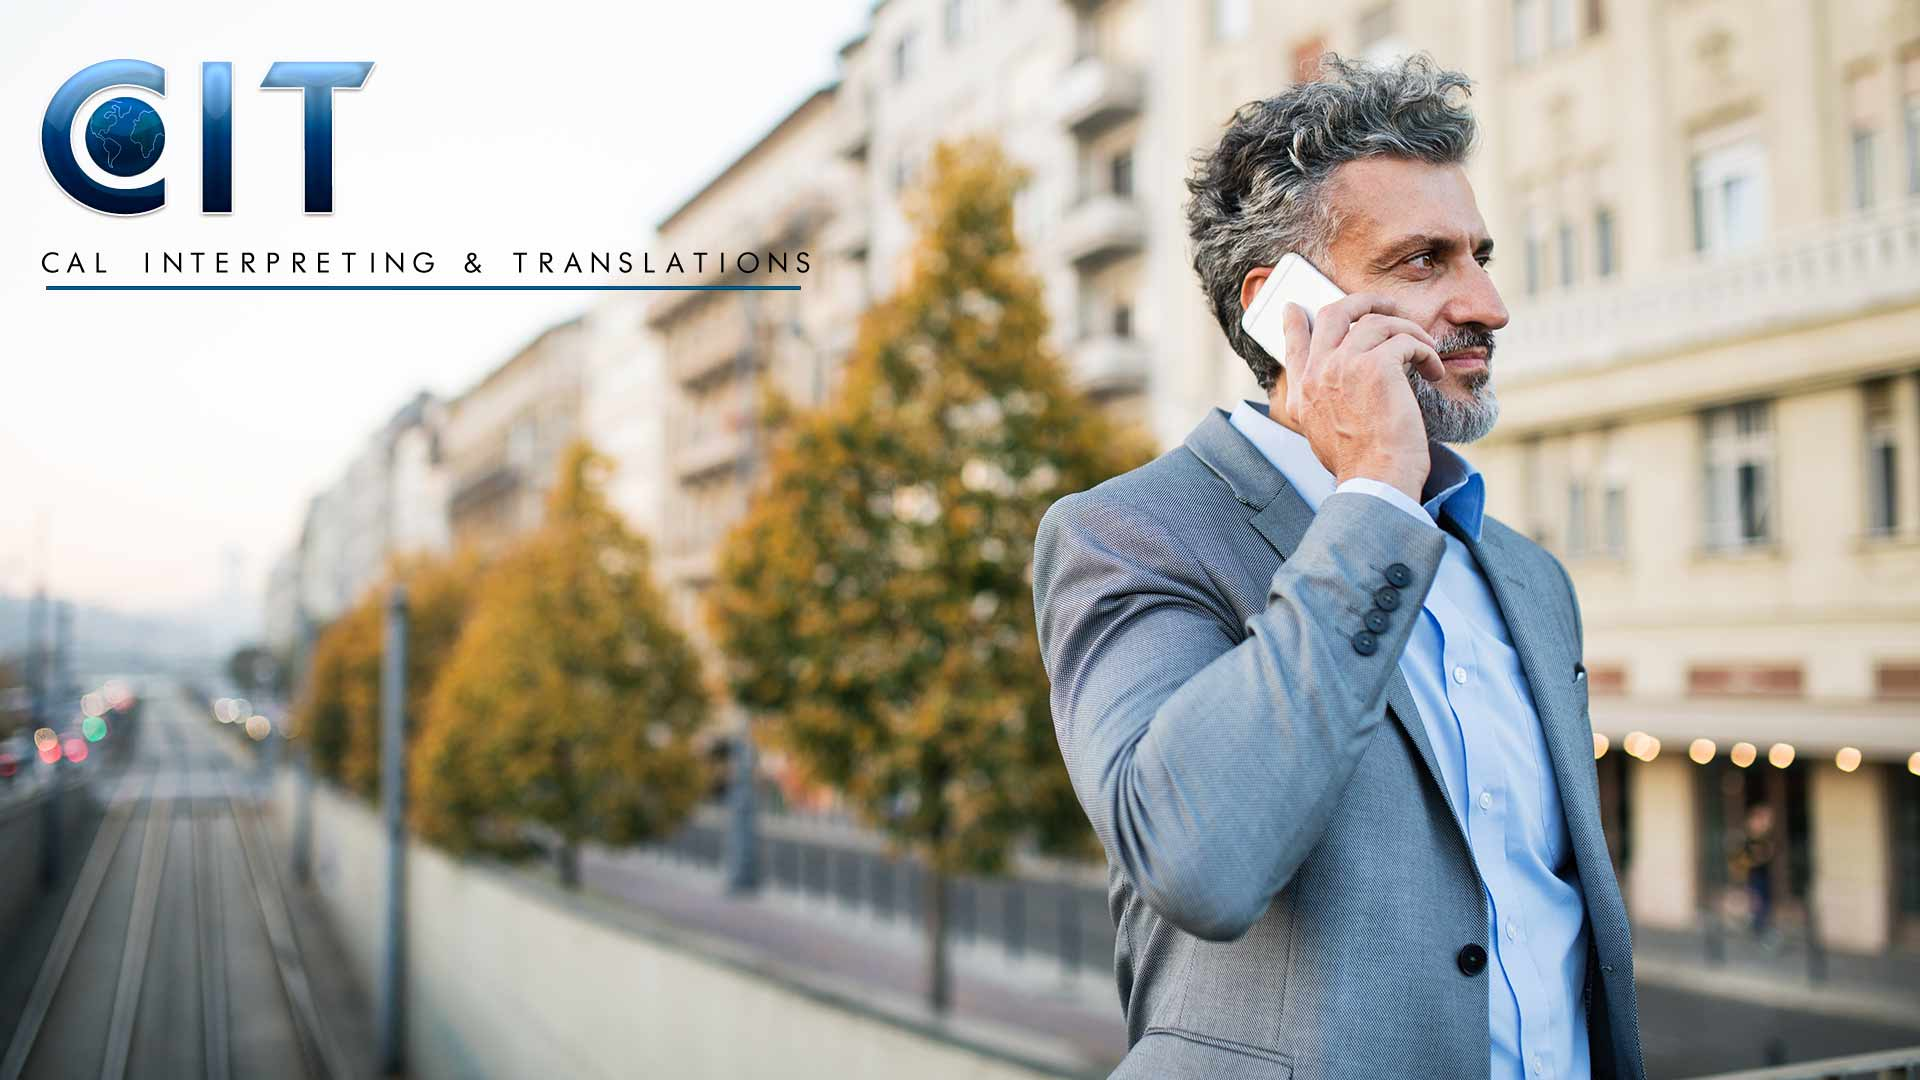 Business traveler using CIT telephonic interpreting service